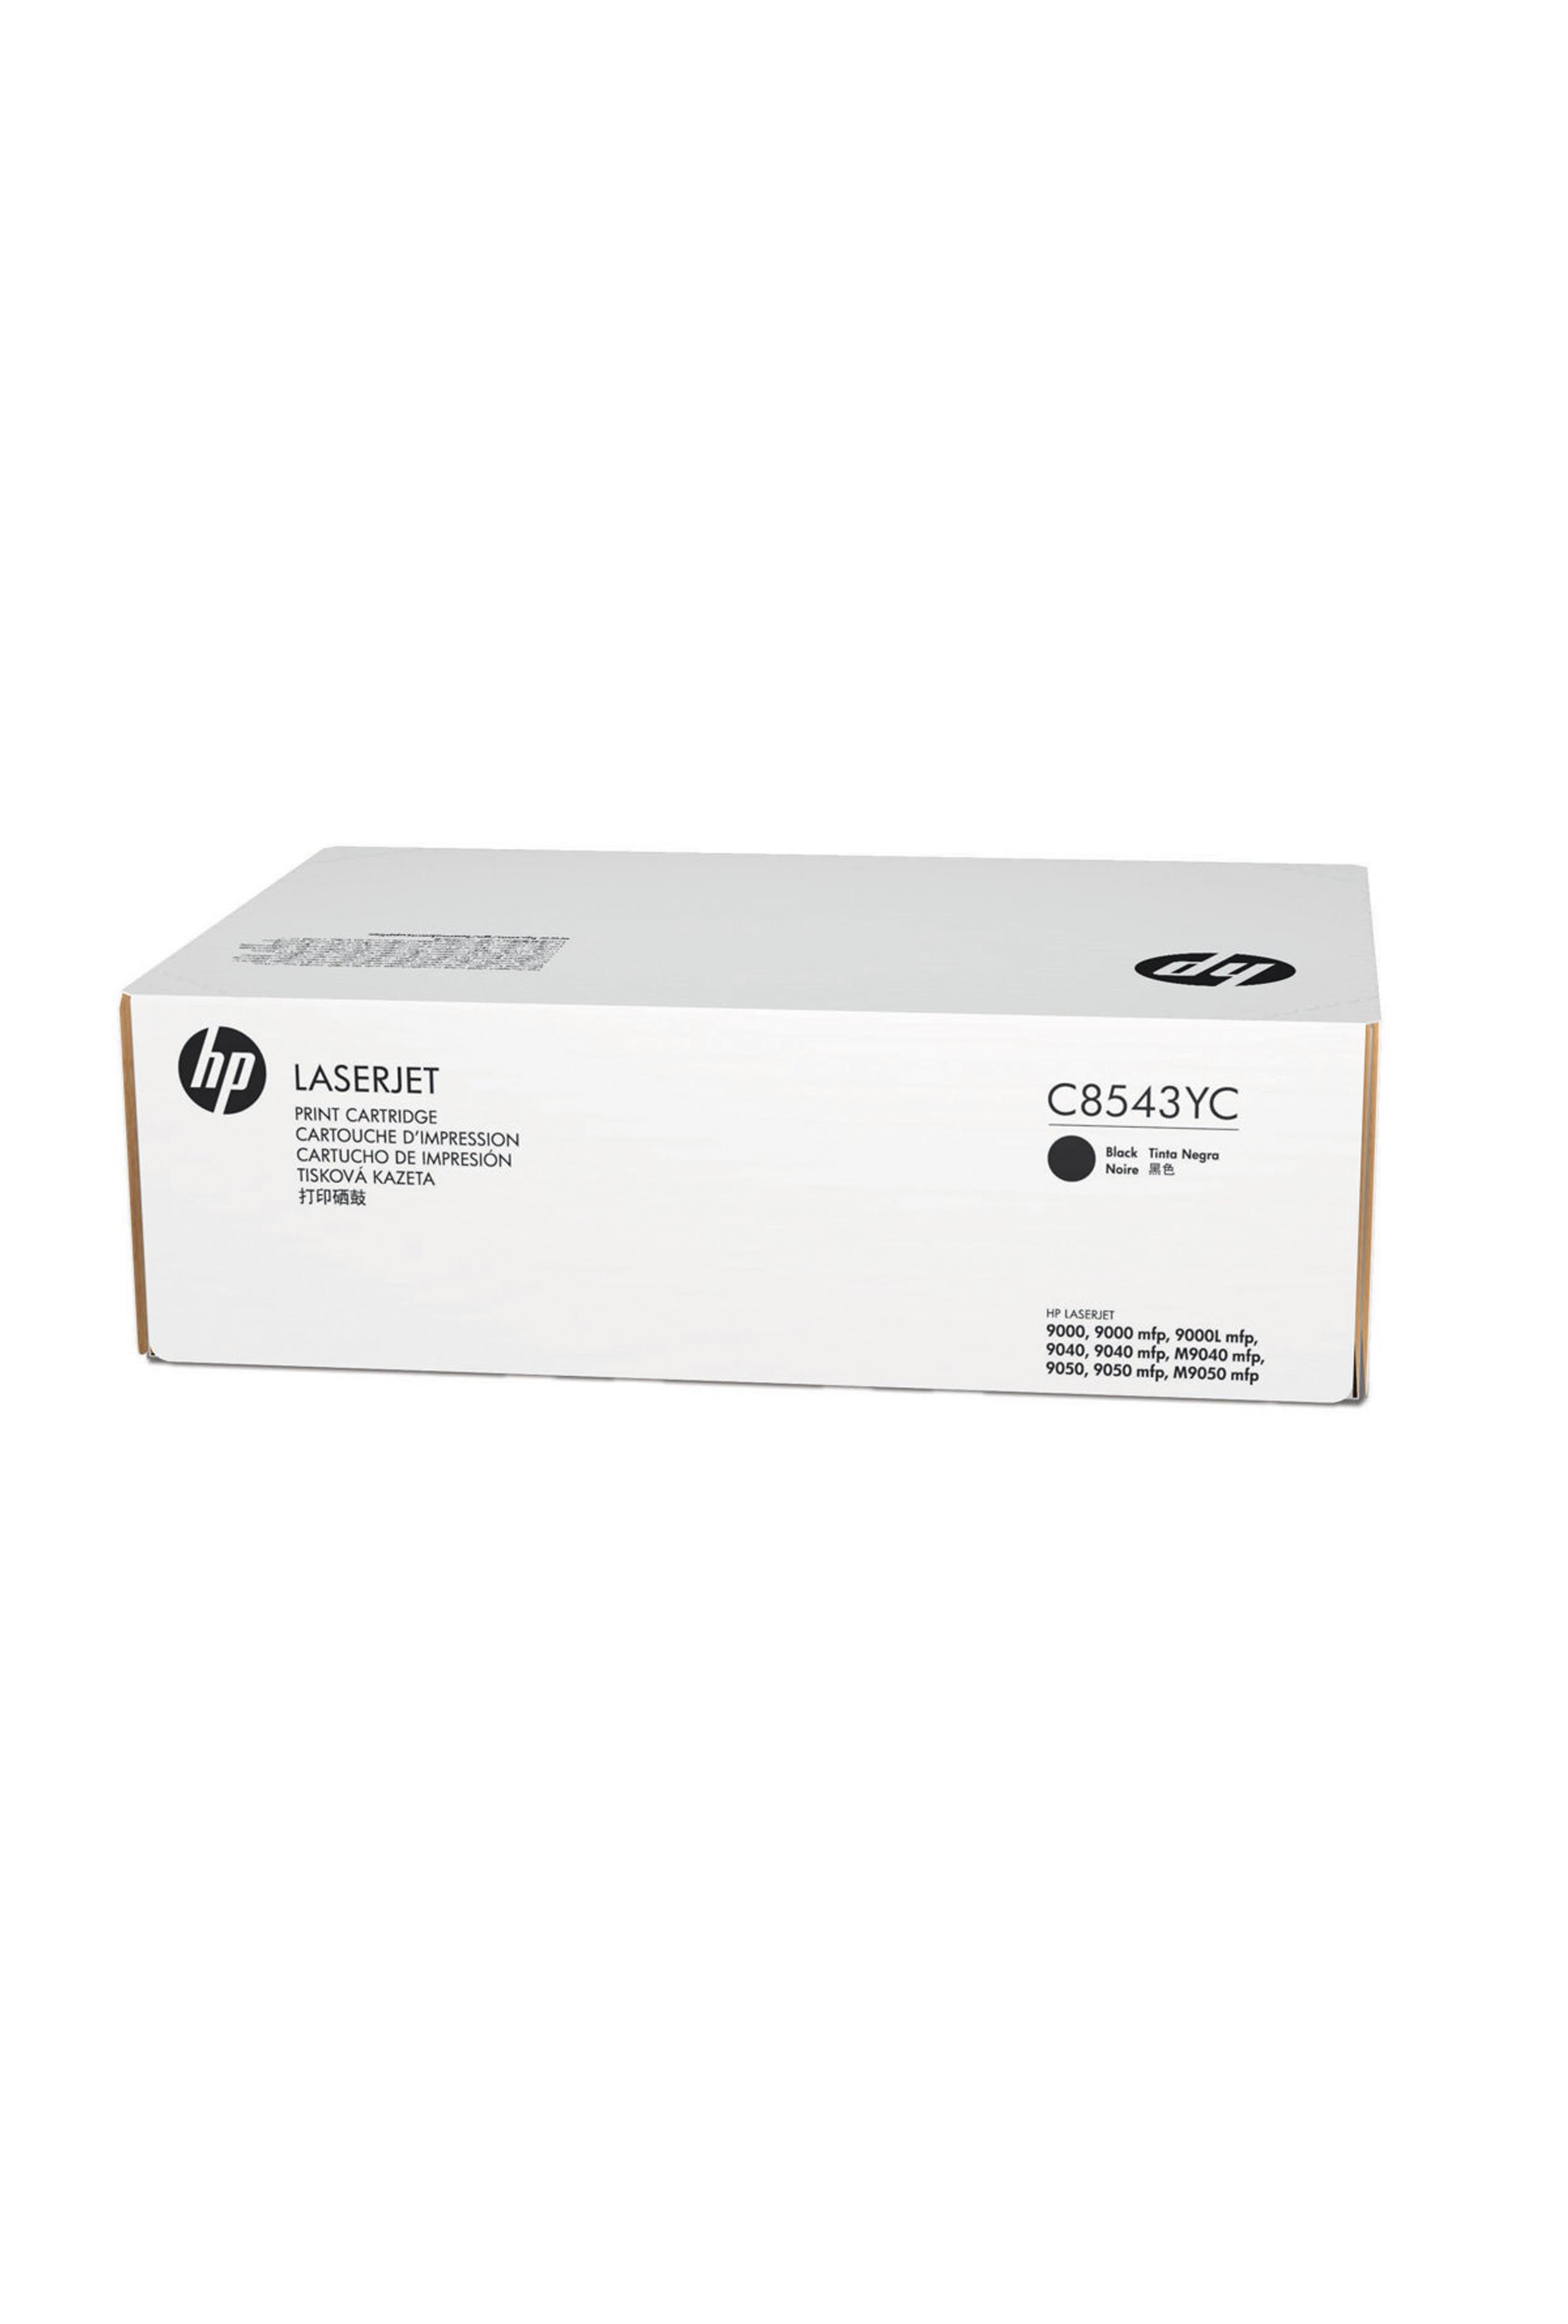 HP Laser Cartrdige 35K (C8543YC)